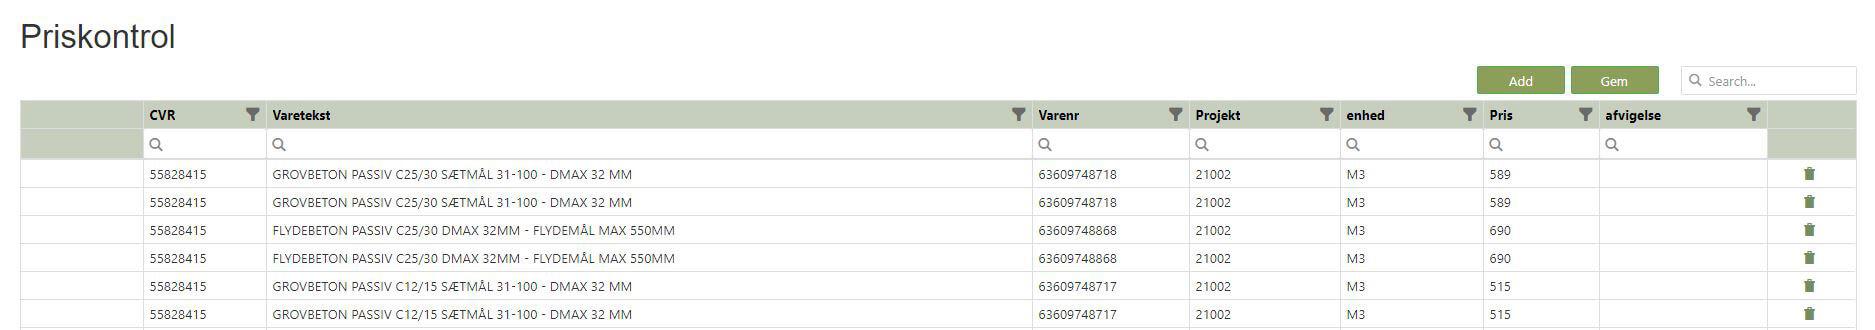 Priskontrol tabel Faktura-Boks